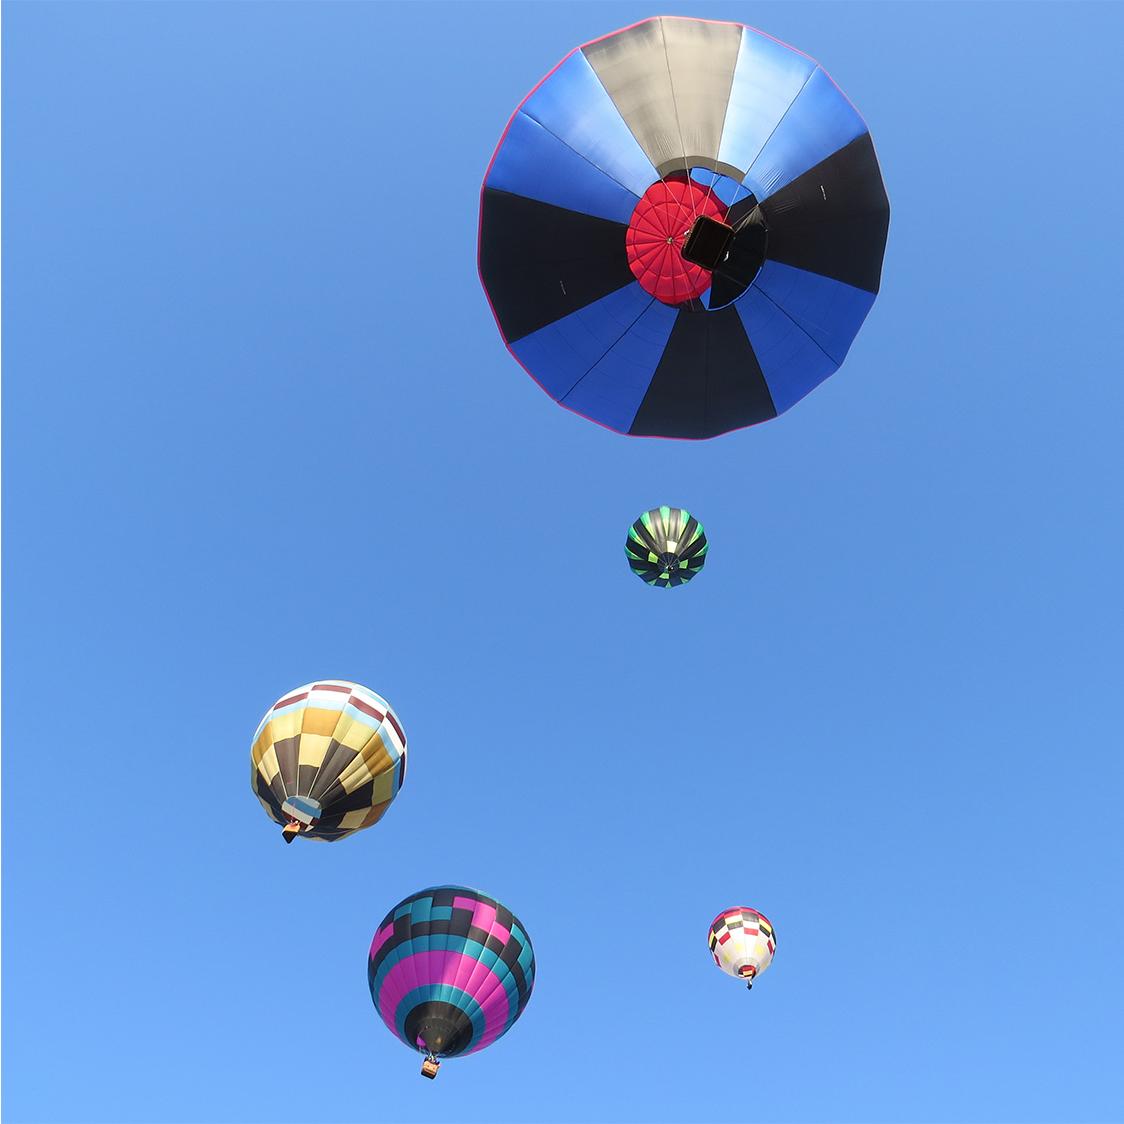 hot_air_balloon_festival_sky.jpg